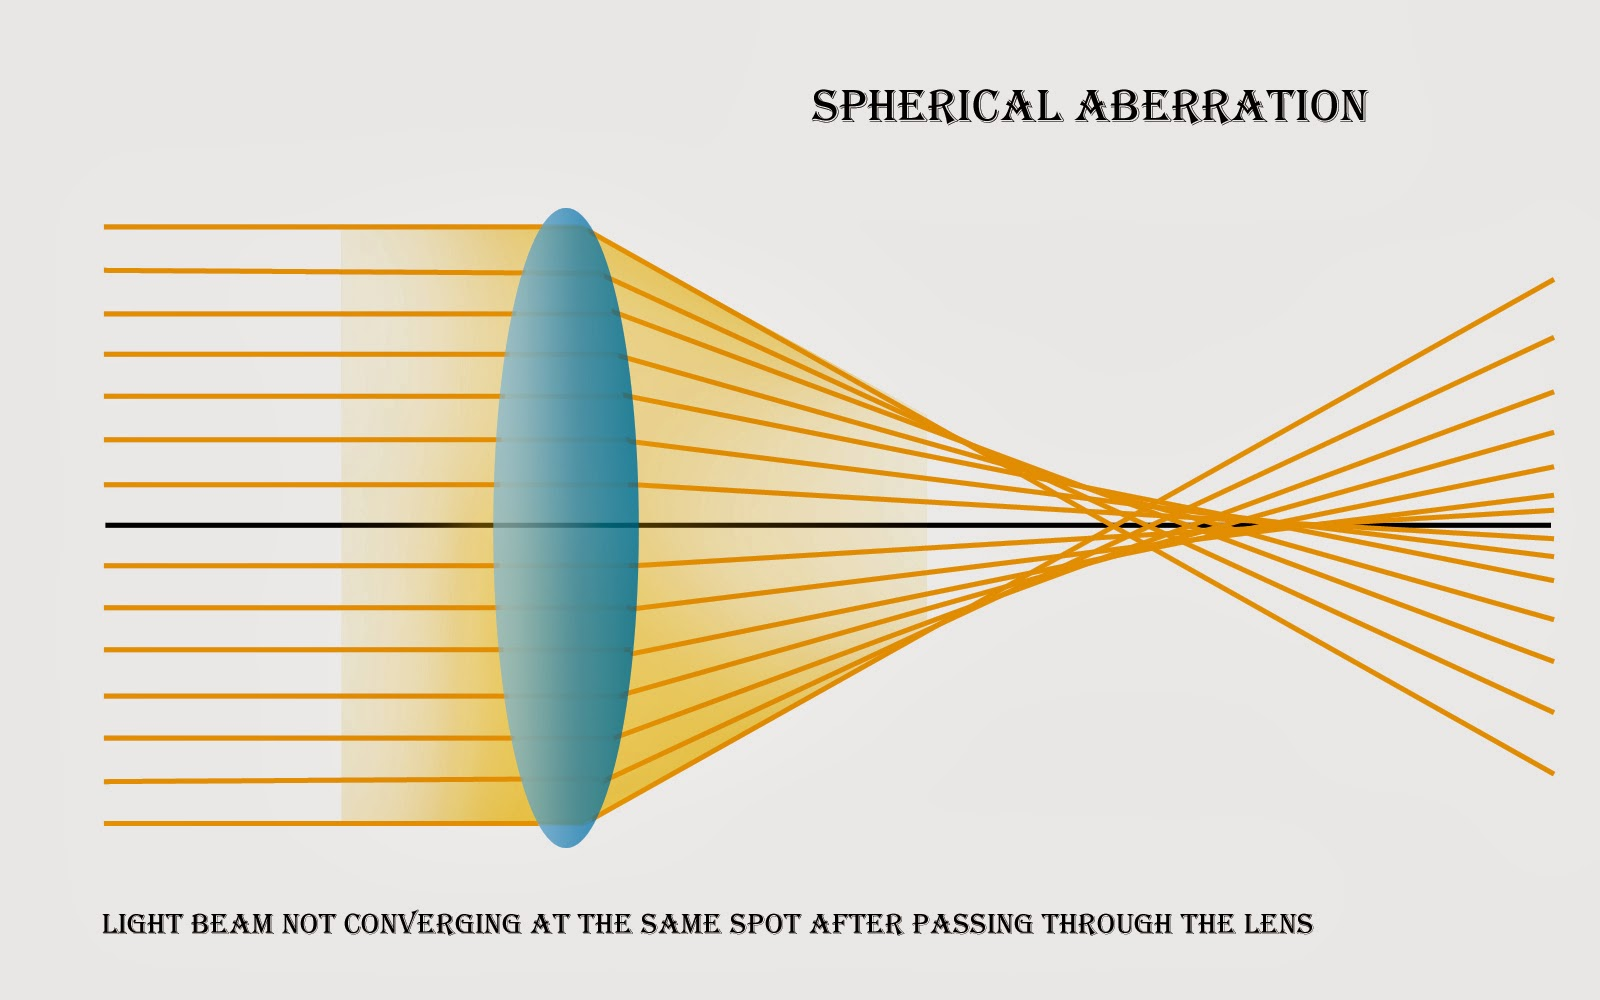 shperical aberration